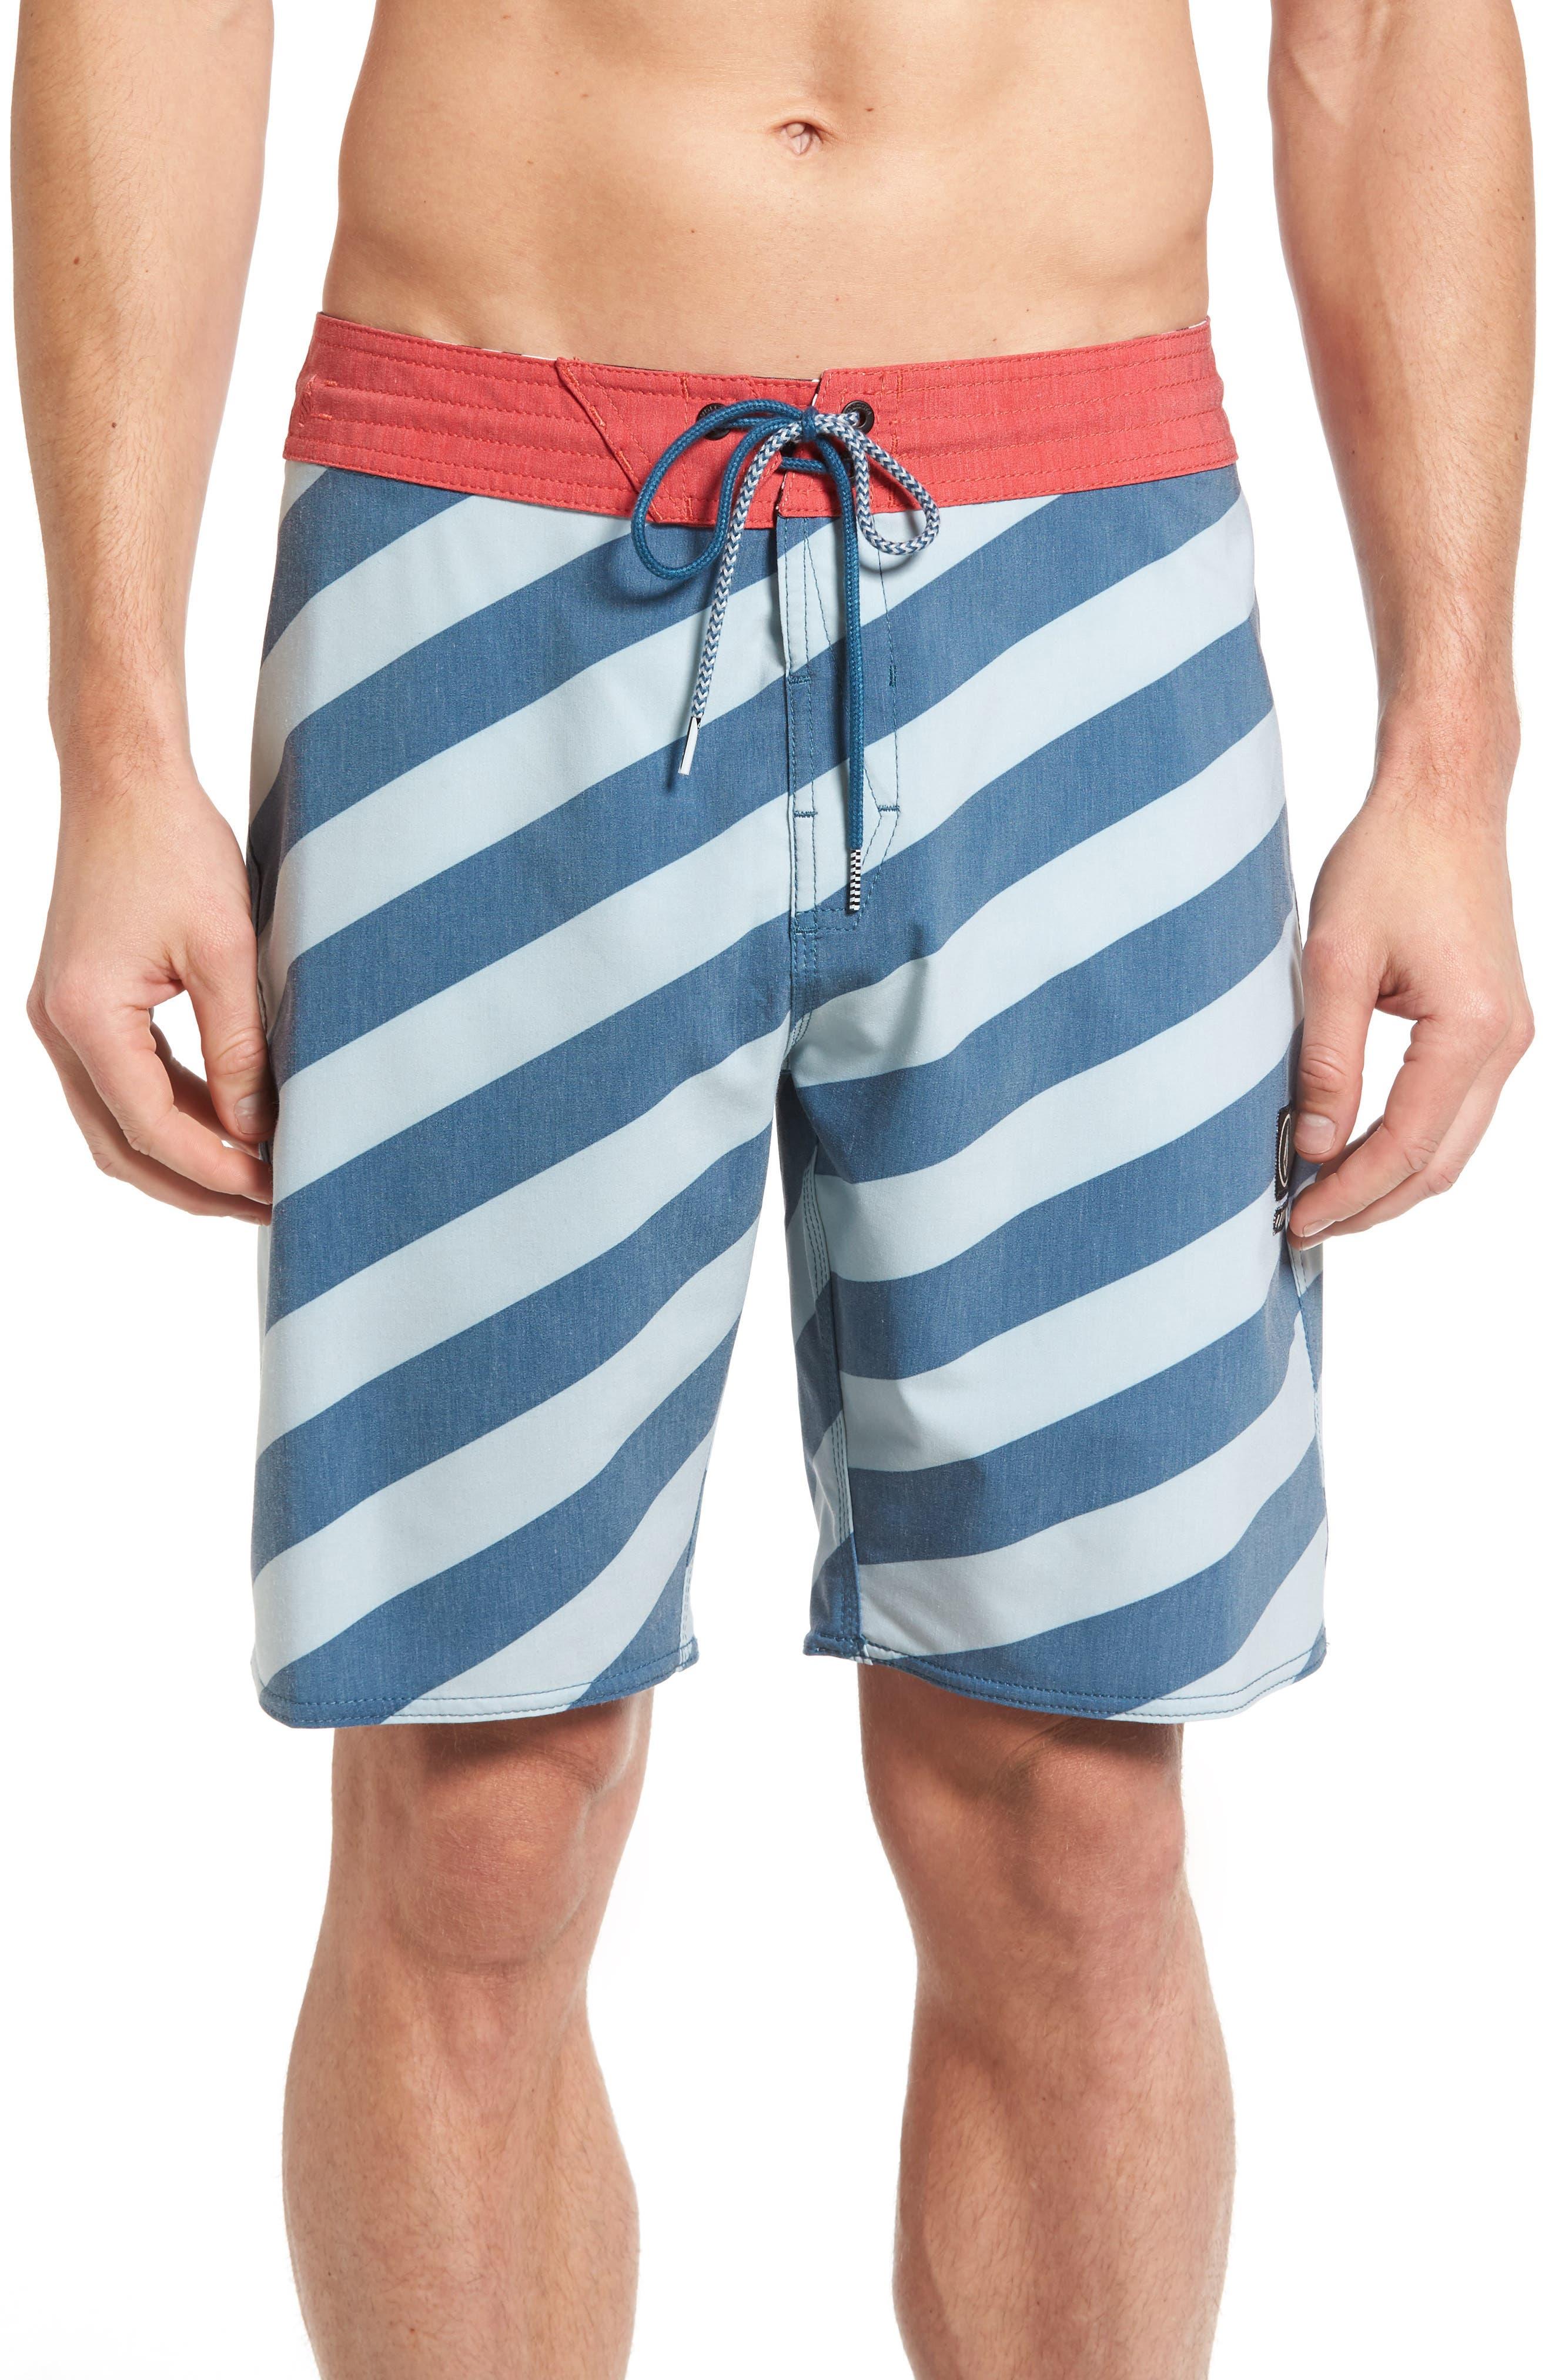 Stripey Slinger Board Shorts,                             Main thumbnail 1, color,                             Flight Blue